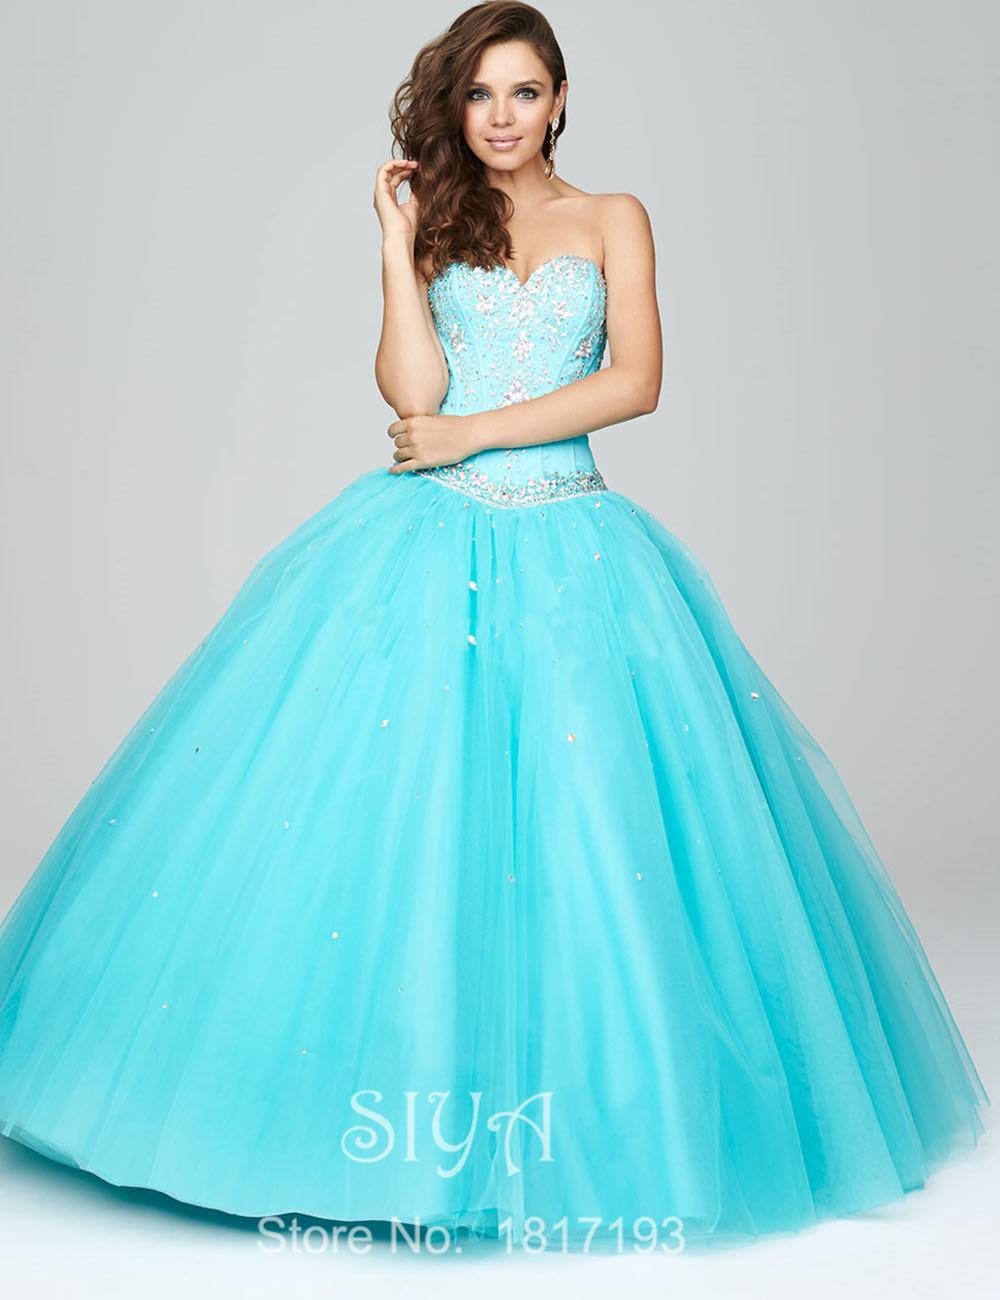 Popular Aqua Blue Wedding Dresses Buy Cheap Aqua Blue Wedding Dresses Lots From China Aqua Blue